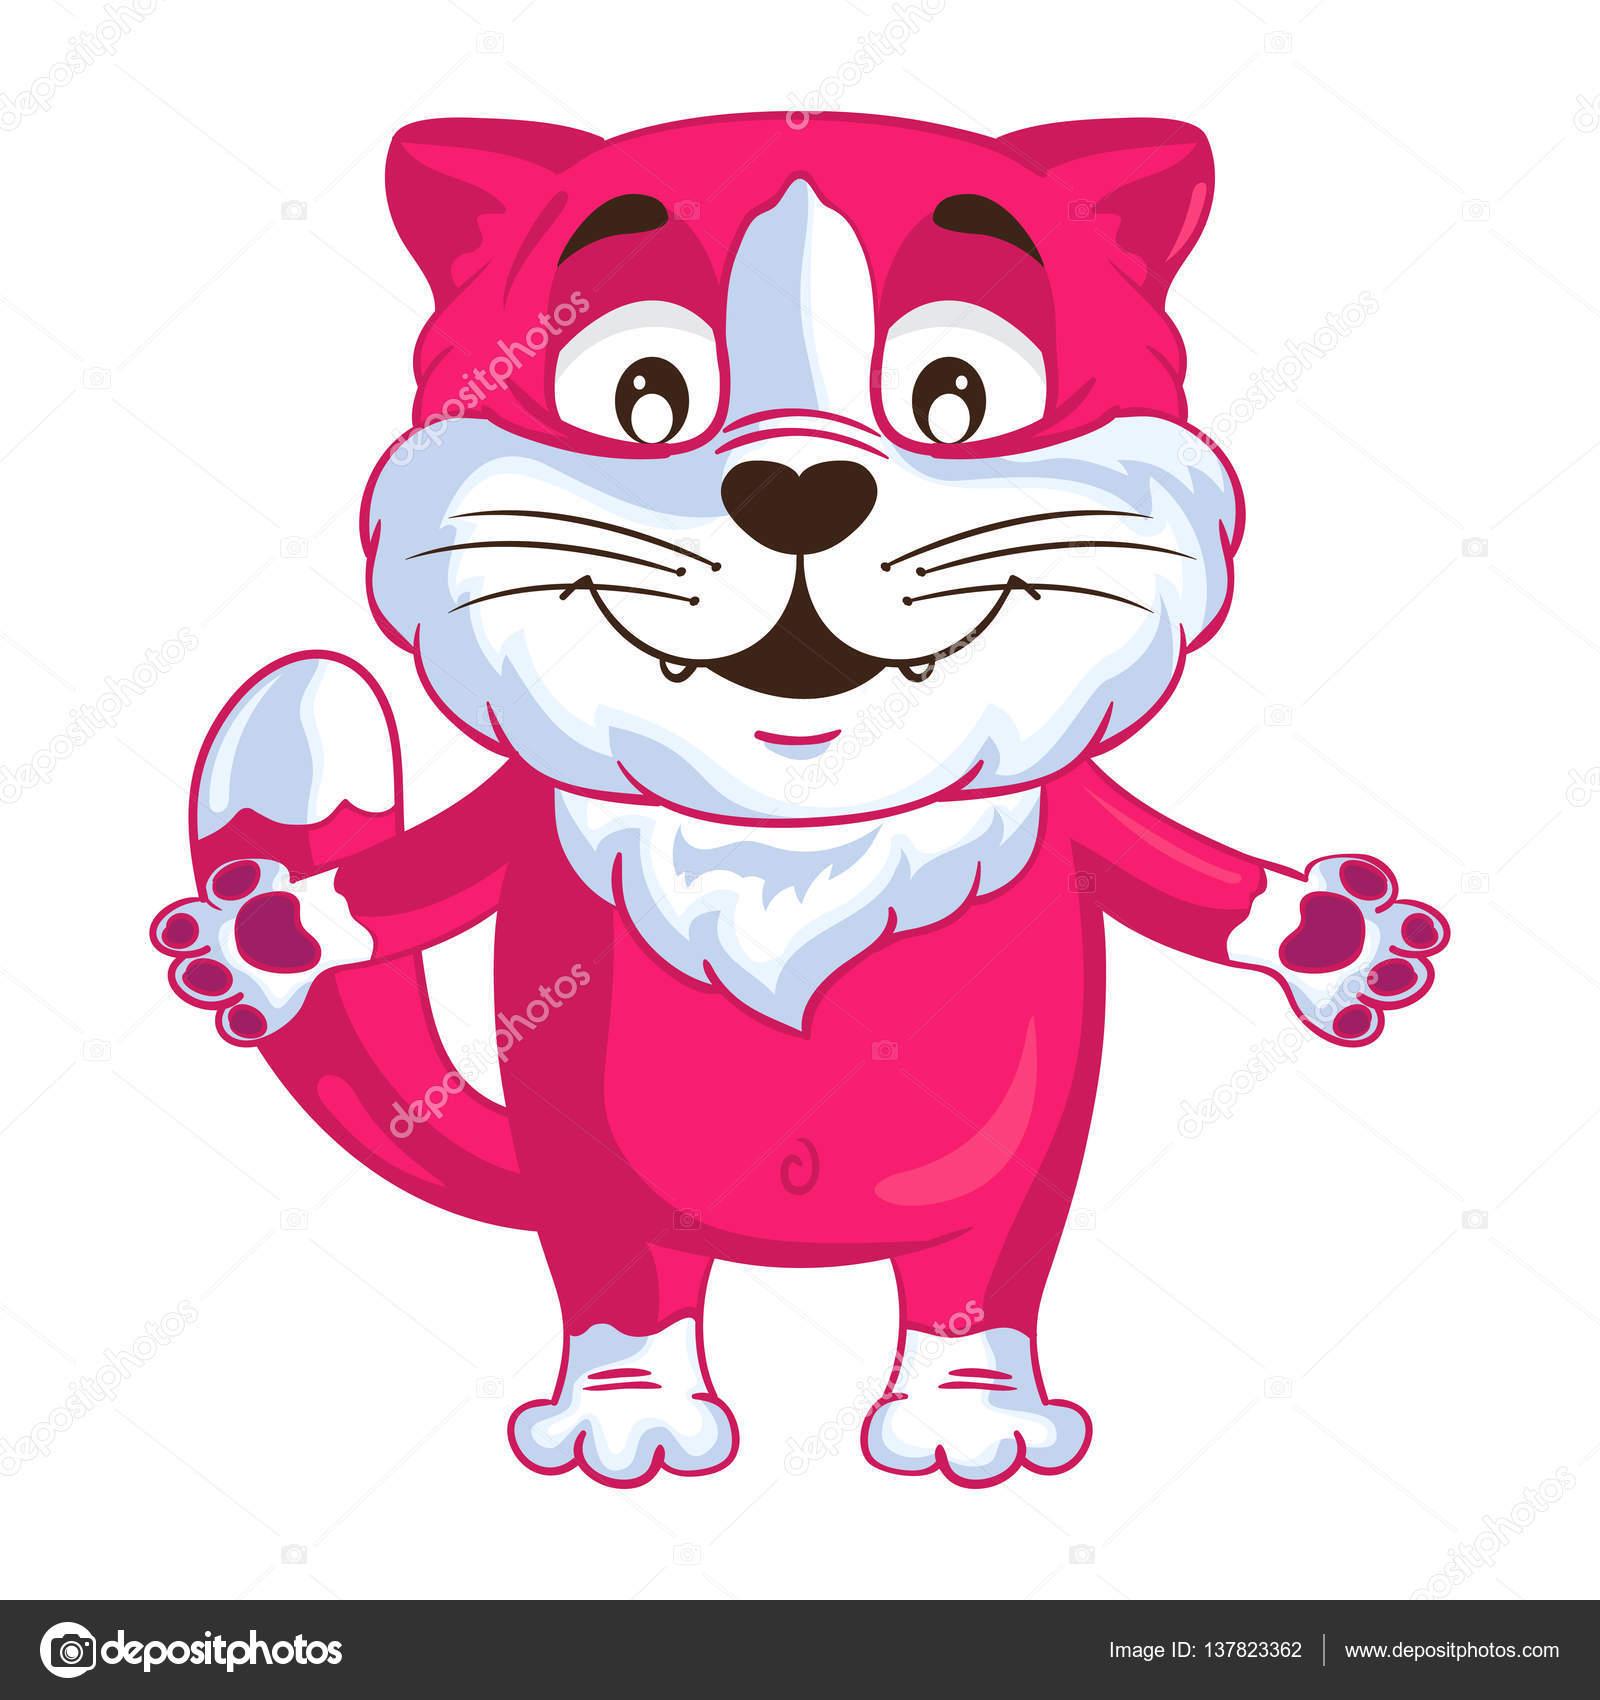 Gato de dibujos animados vector rosa puso sus manos para abrazar ...